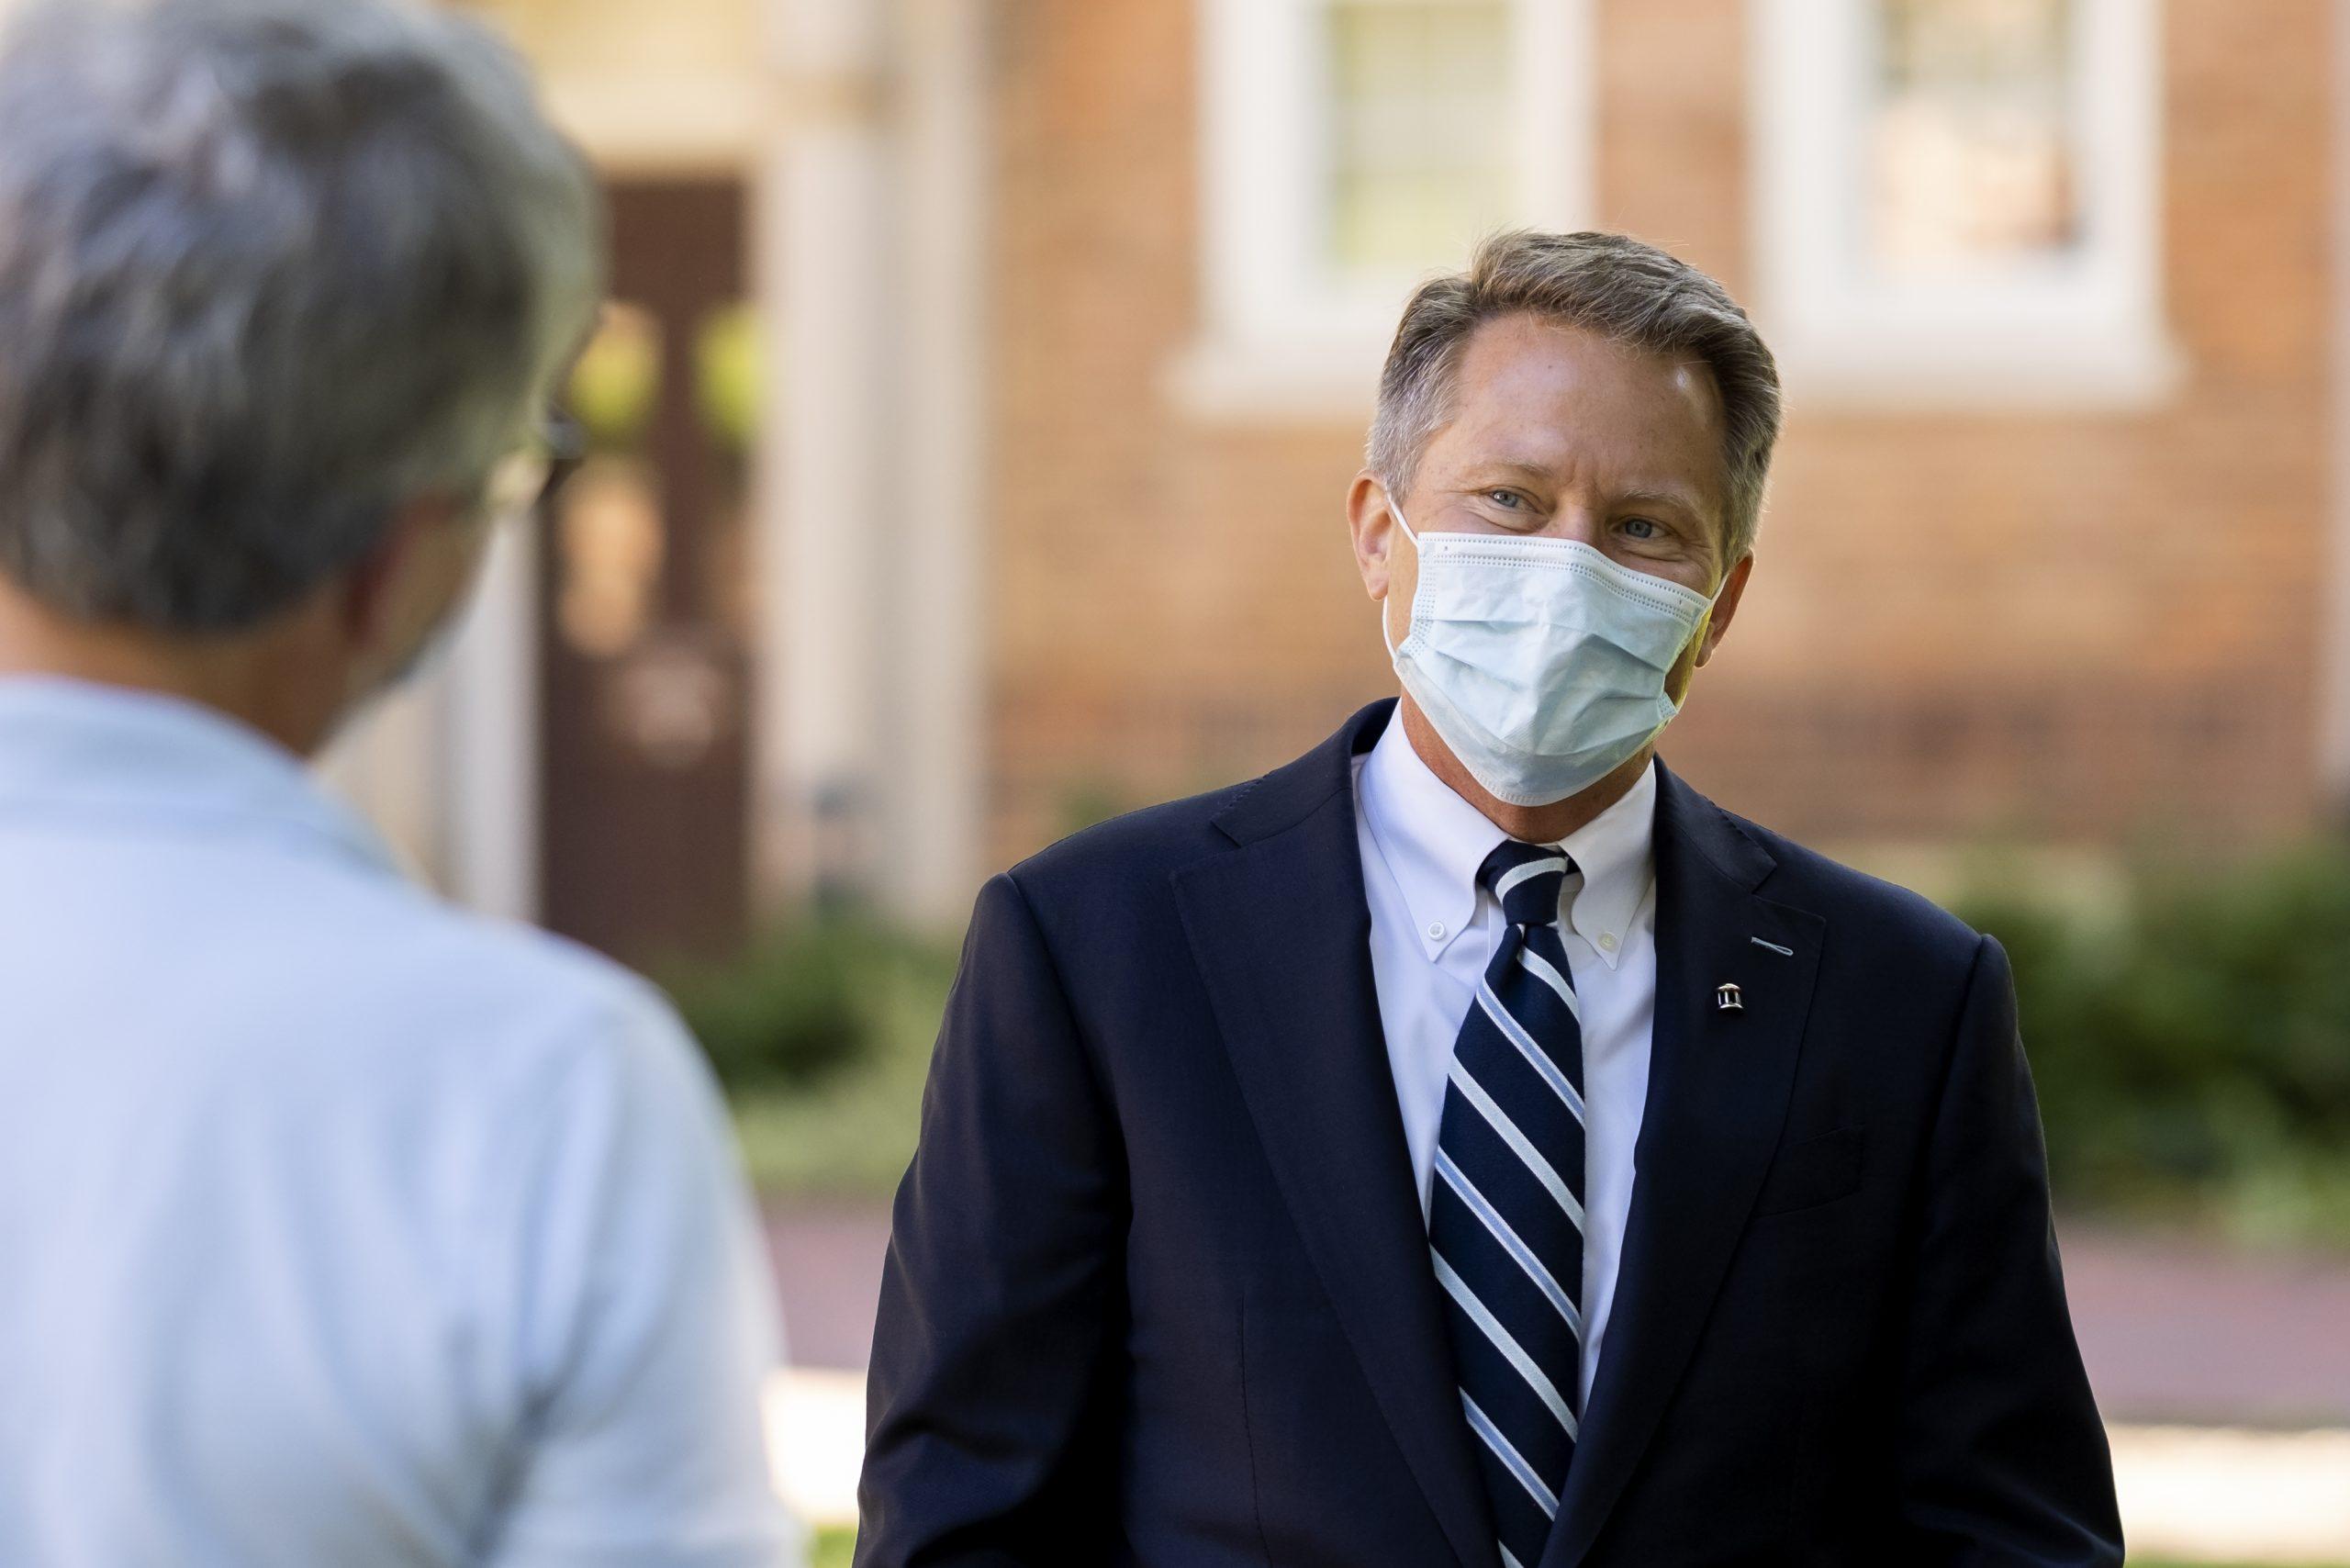 Chancellor Guskiewicz wearing a face mask.